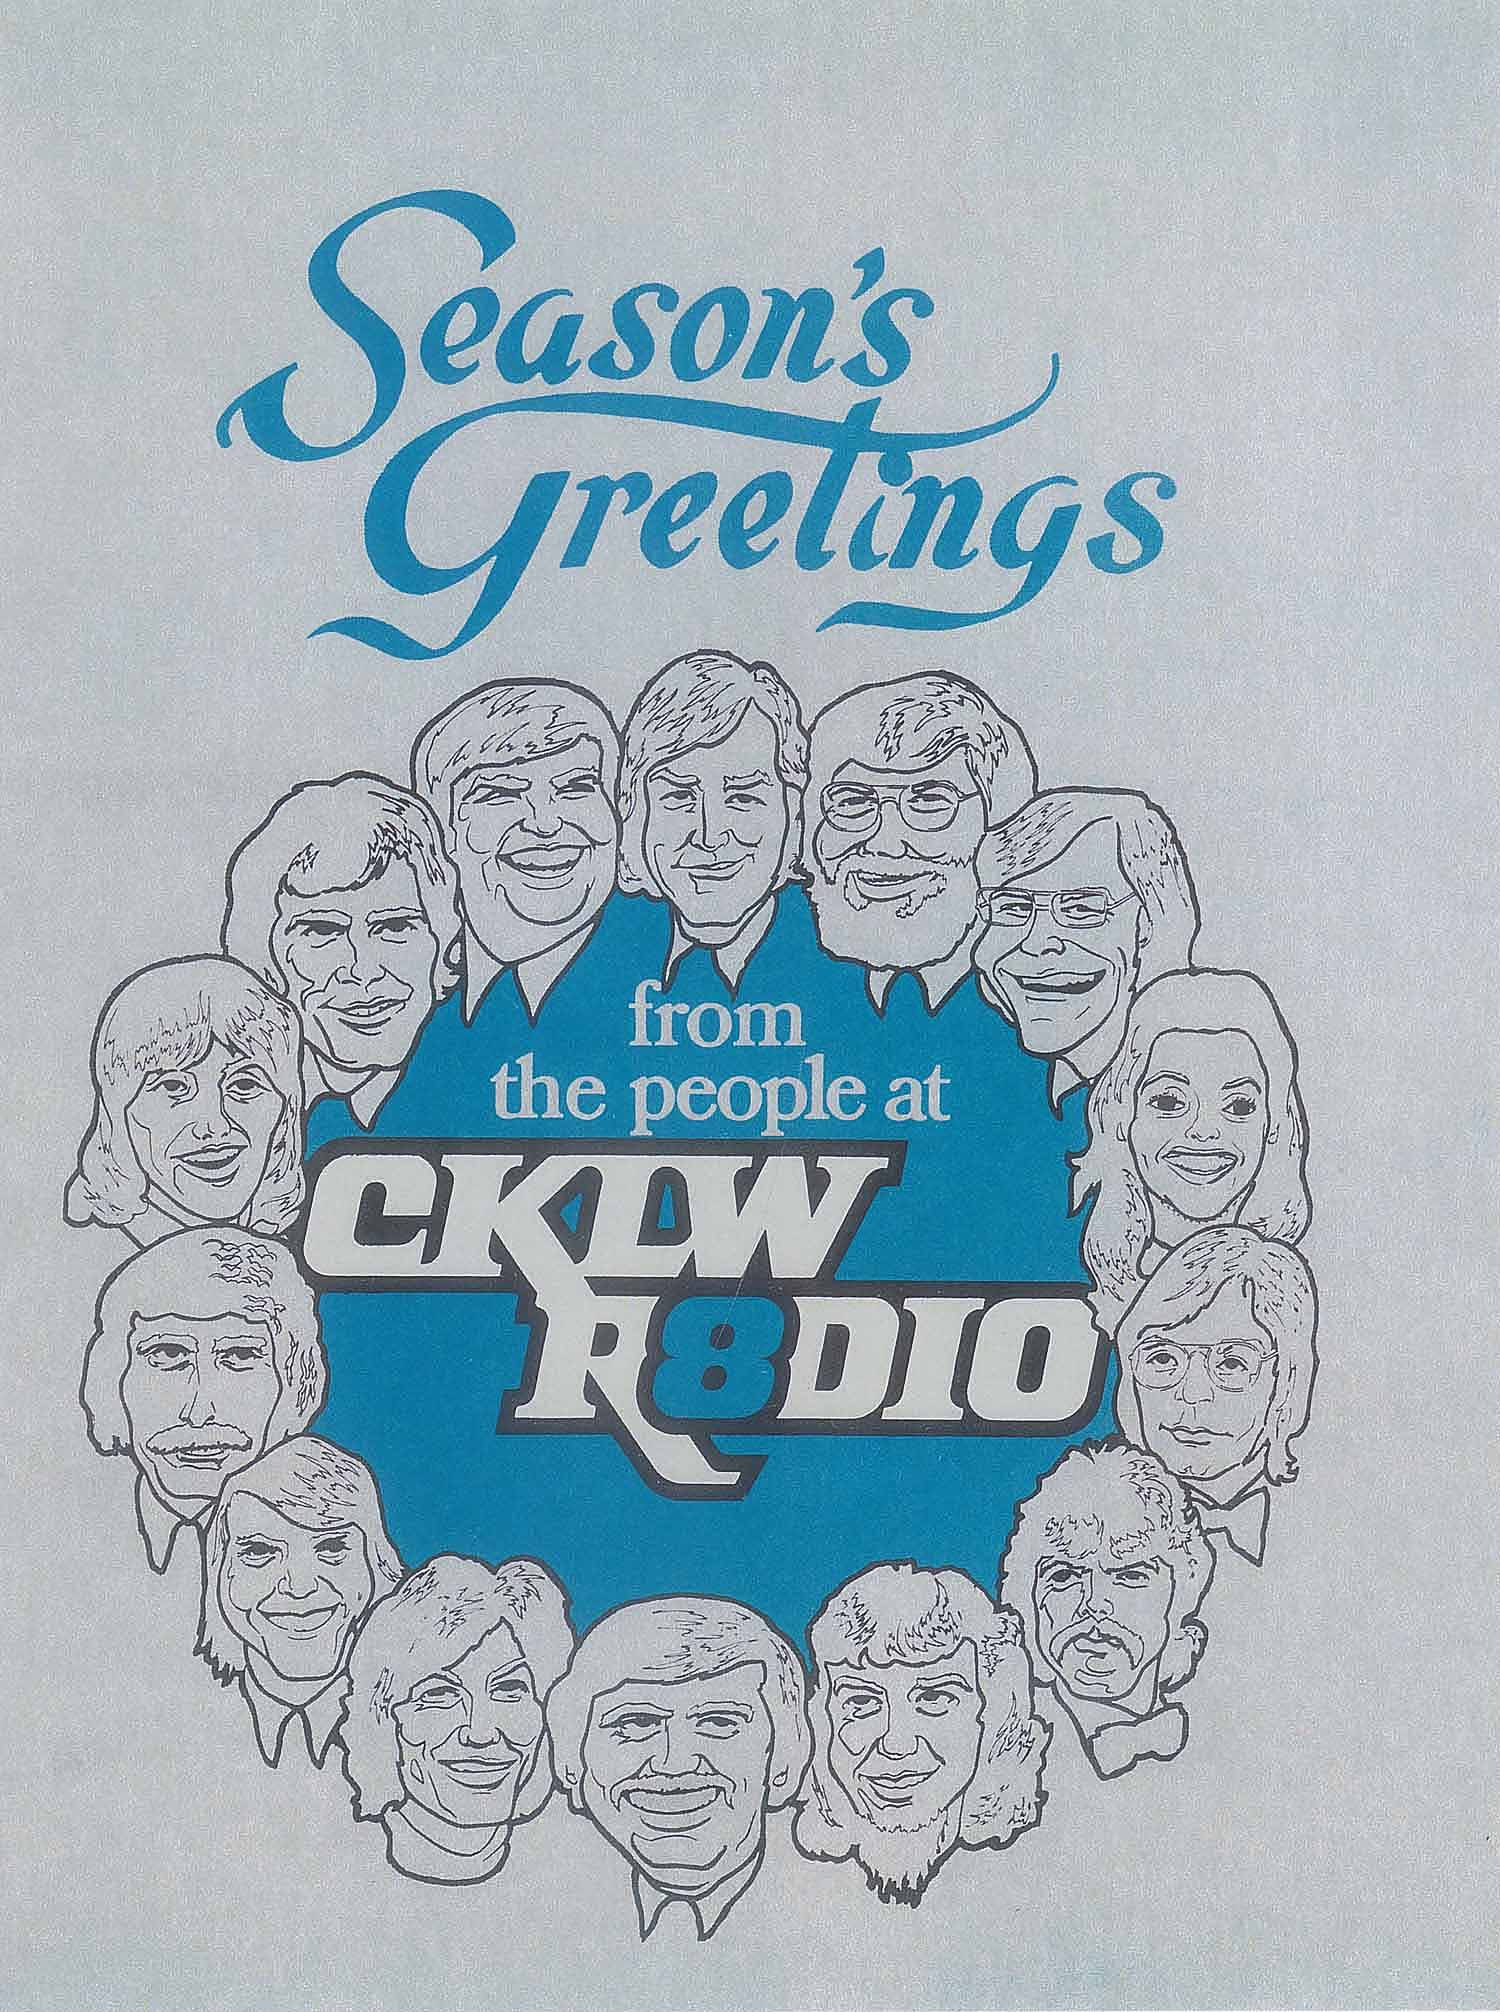 CKLW Seasons Greetings (MCRFB)